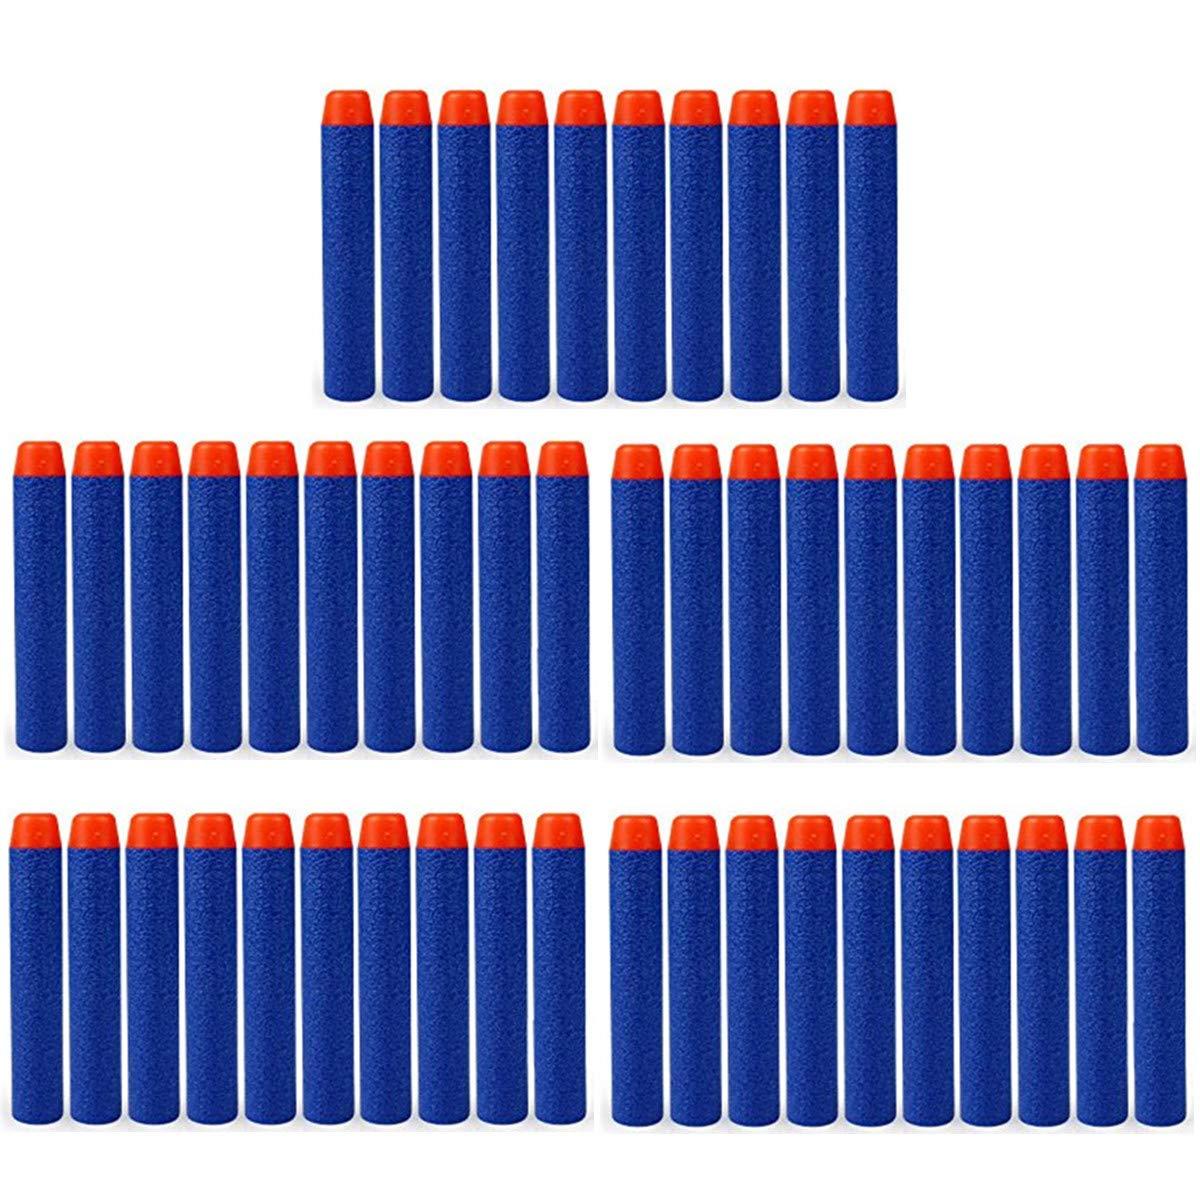 HONGCI 50pcs 7.2cm Blue Foam Darts for Nerf N-strike Elite Series Blasters Toy Guns